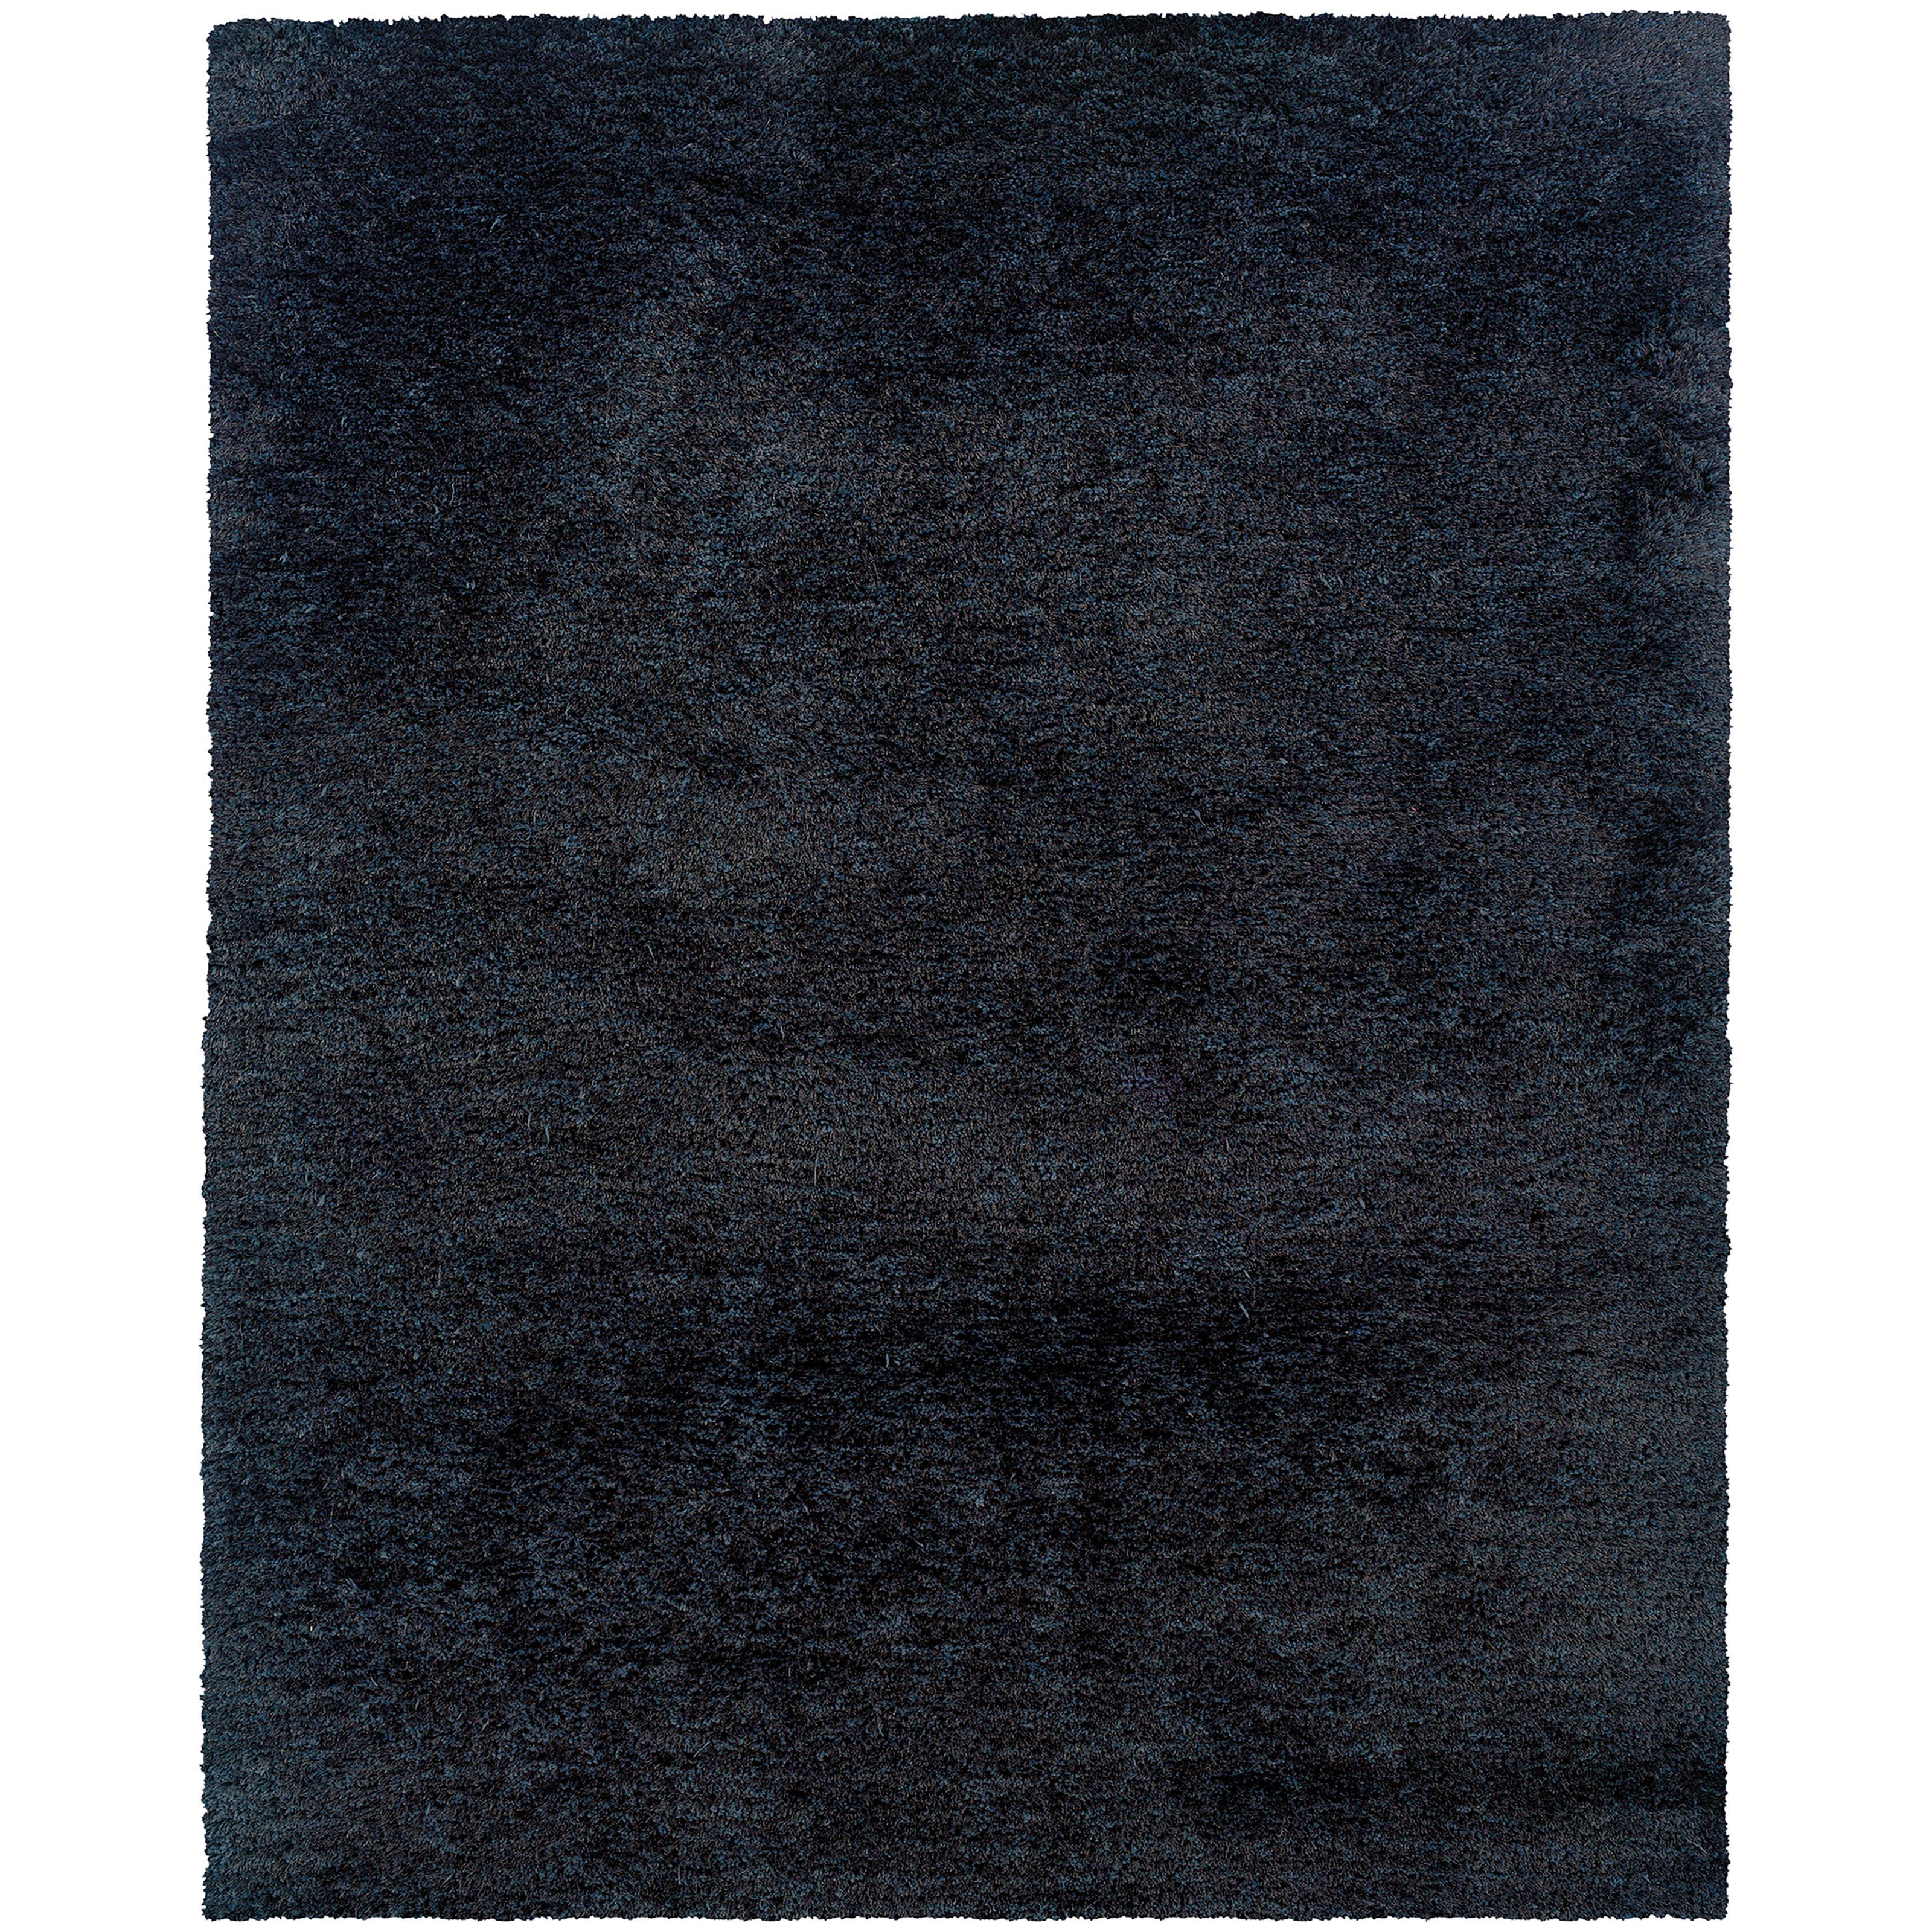 "Oriental Weavers Cosmo 10' 0"" X 13' 0"" Rug - Item Number: C81102305396ST"